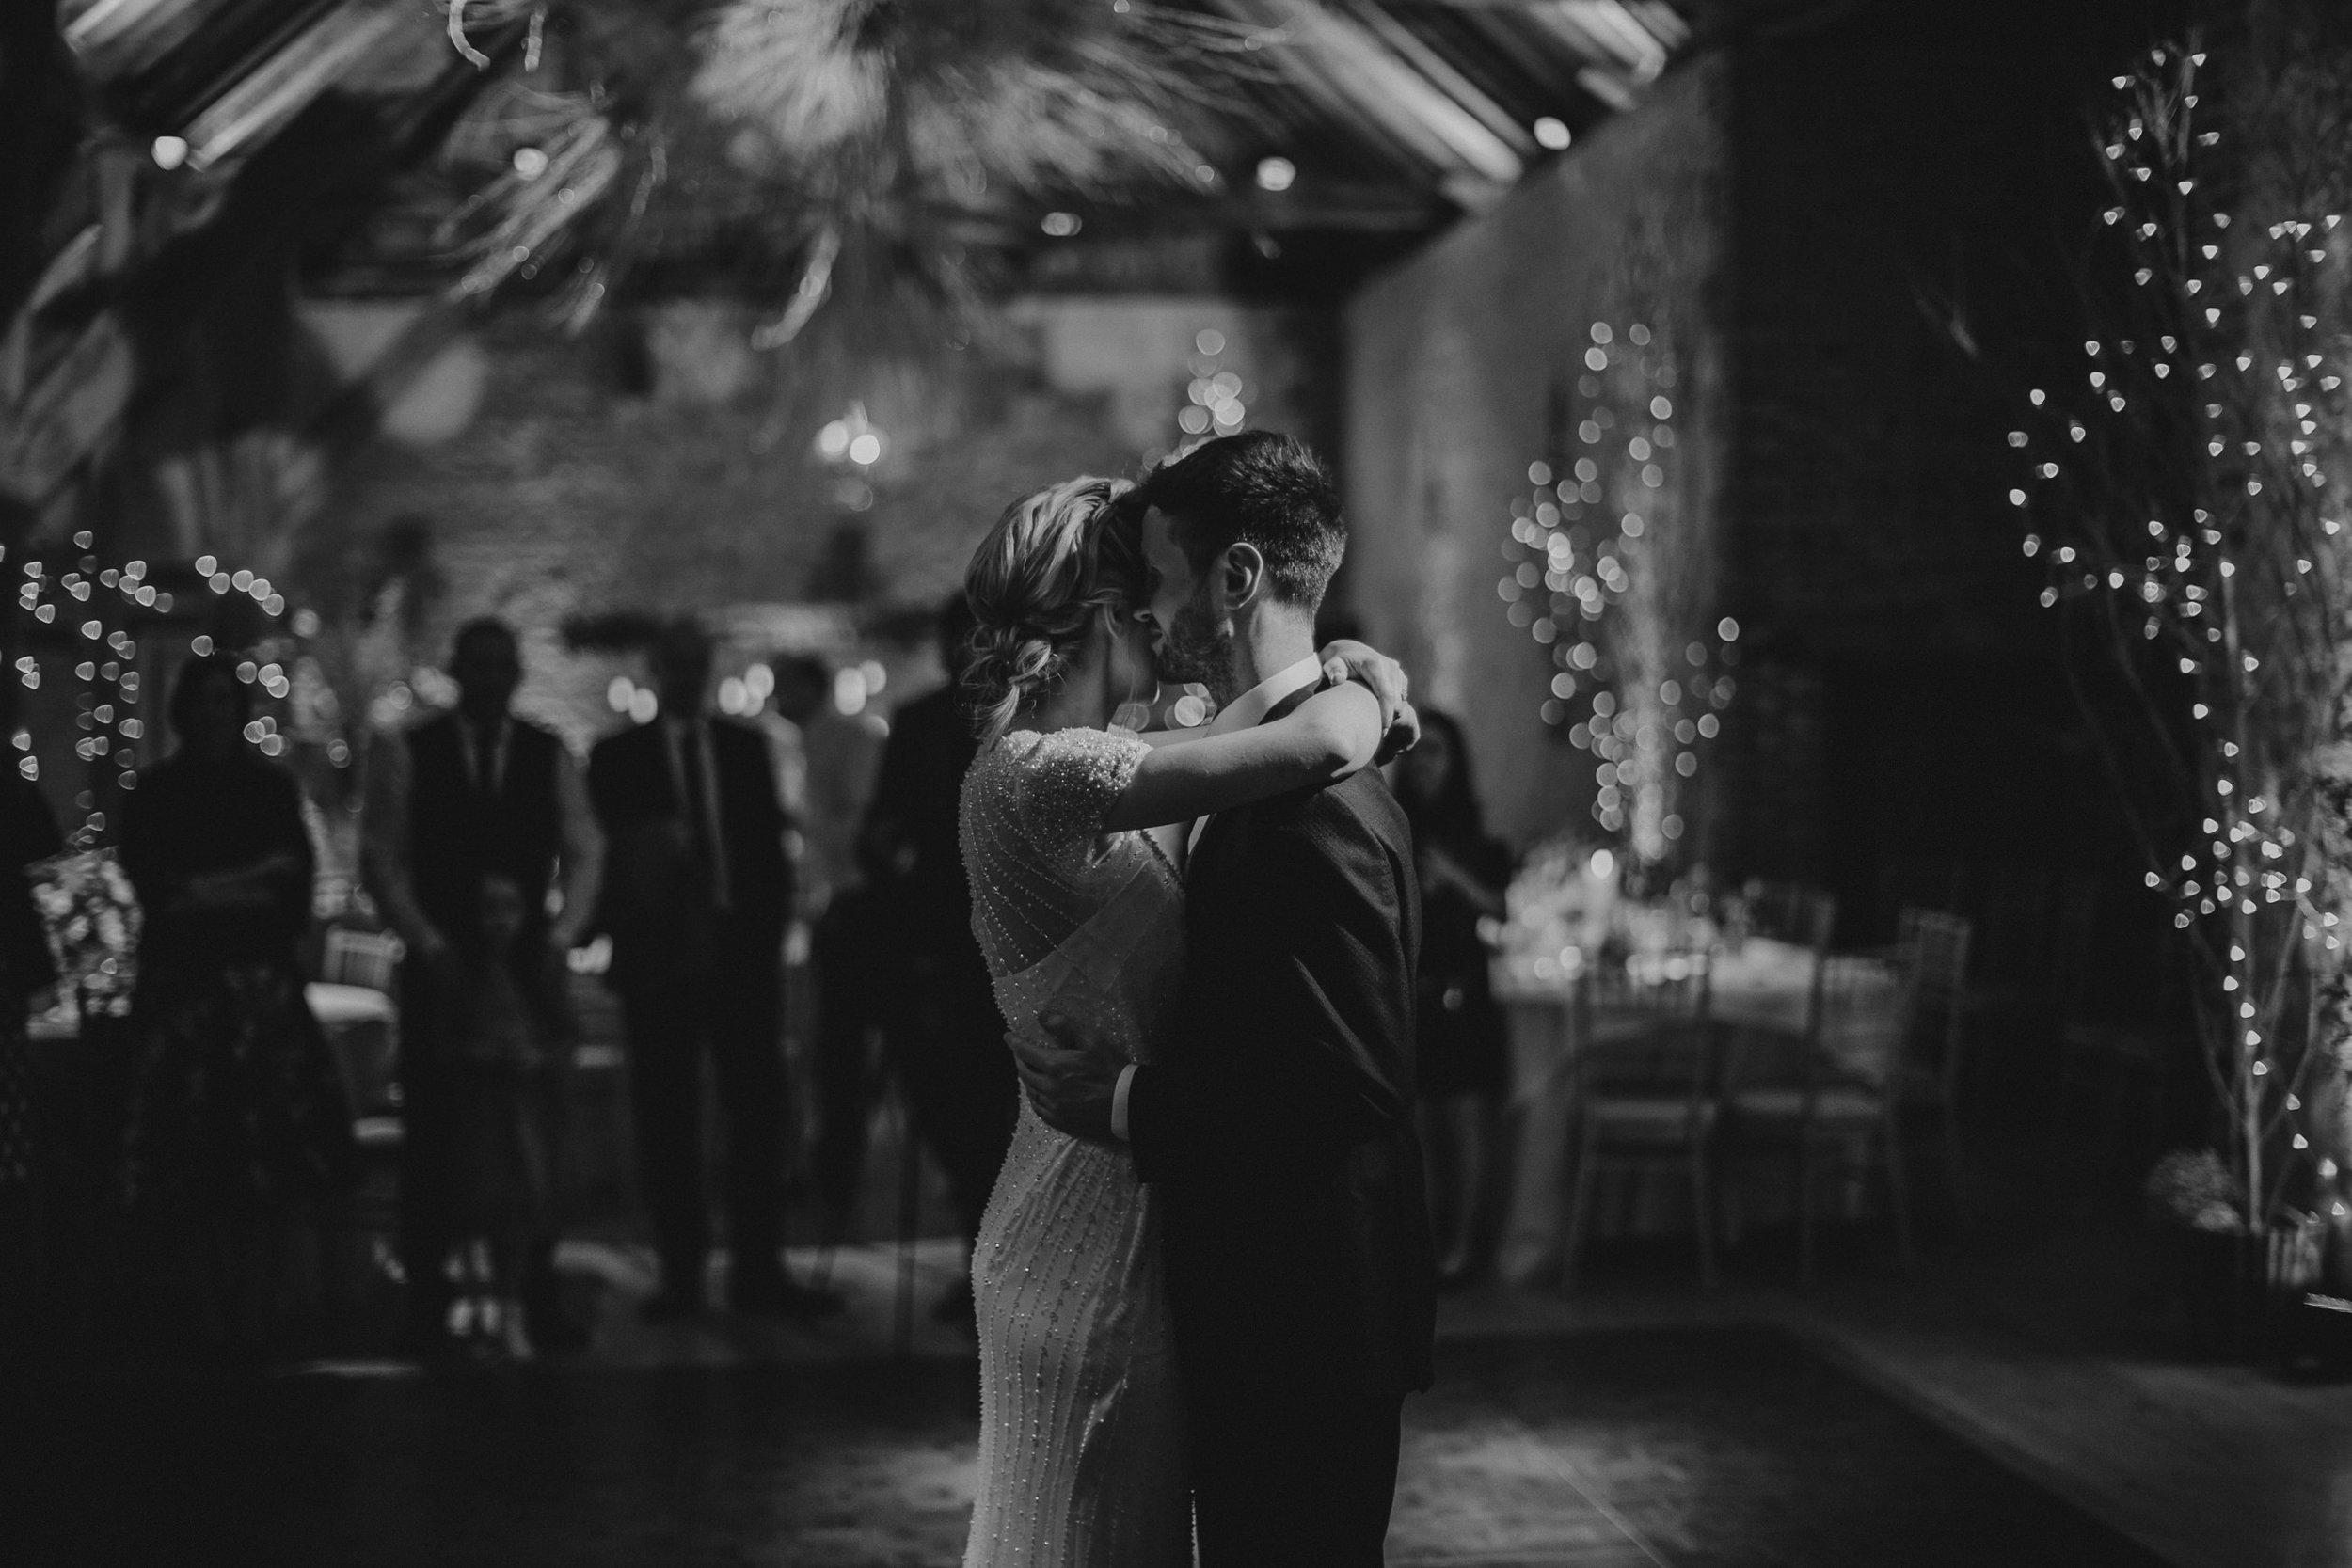 Jenny Packham dress Bury Court Barn Hampshire Wedding Photographer Gione da Silva_034.jpg